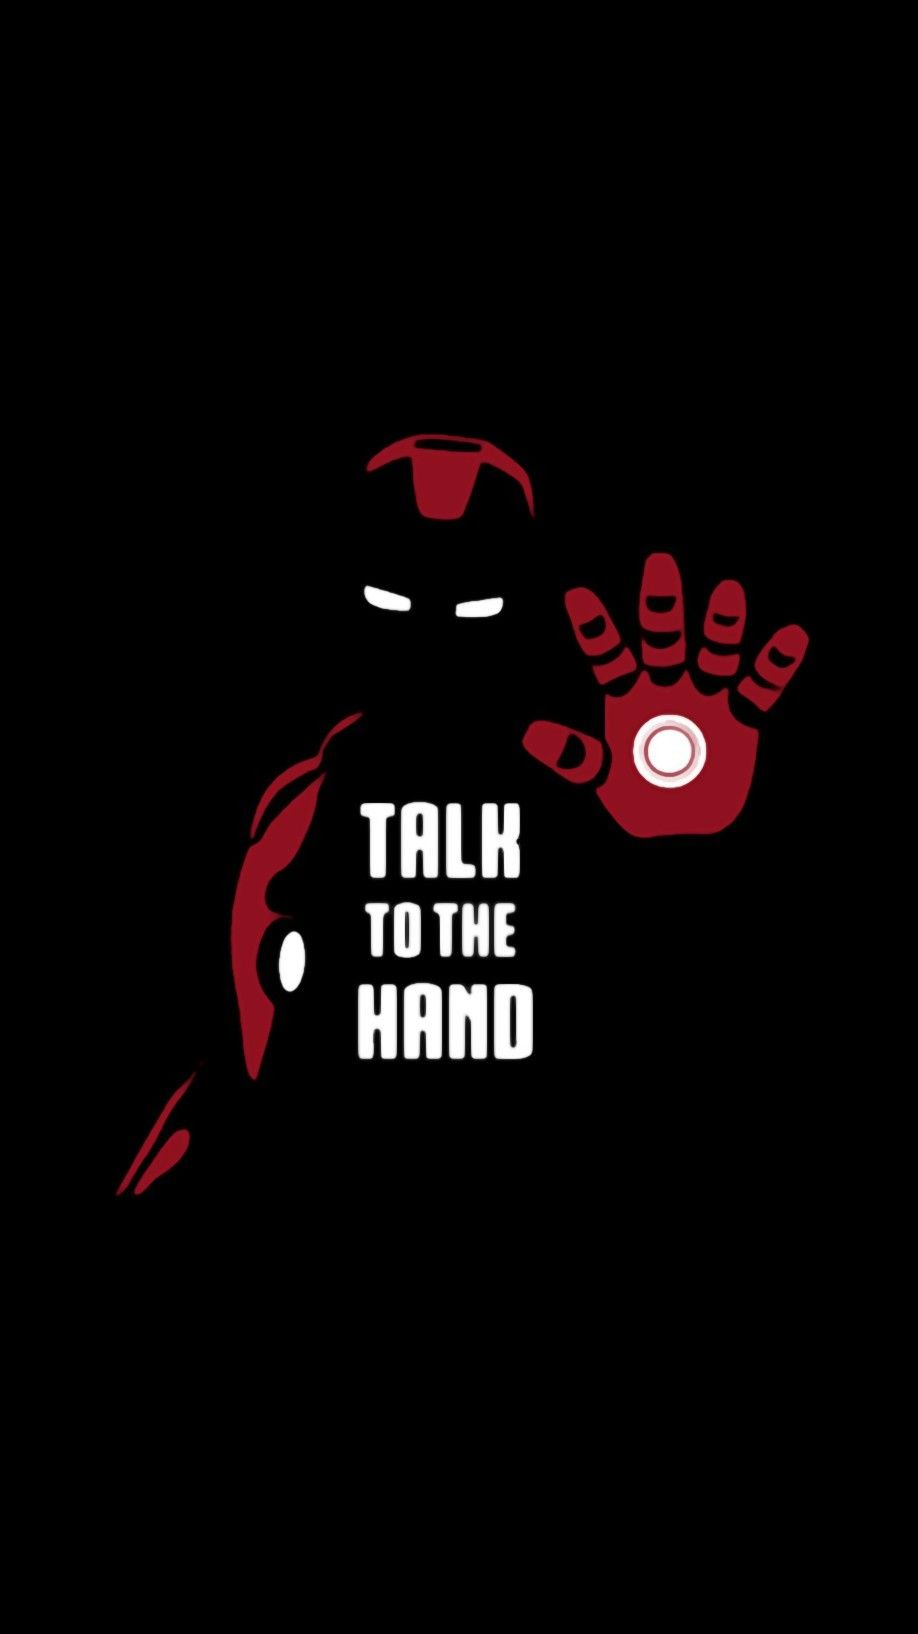 Pin By German On Comic Art Marvel Quotes Iron Man Wallpaper Iron Man Art